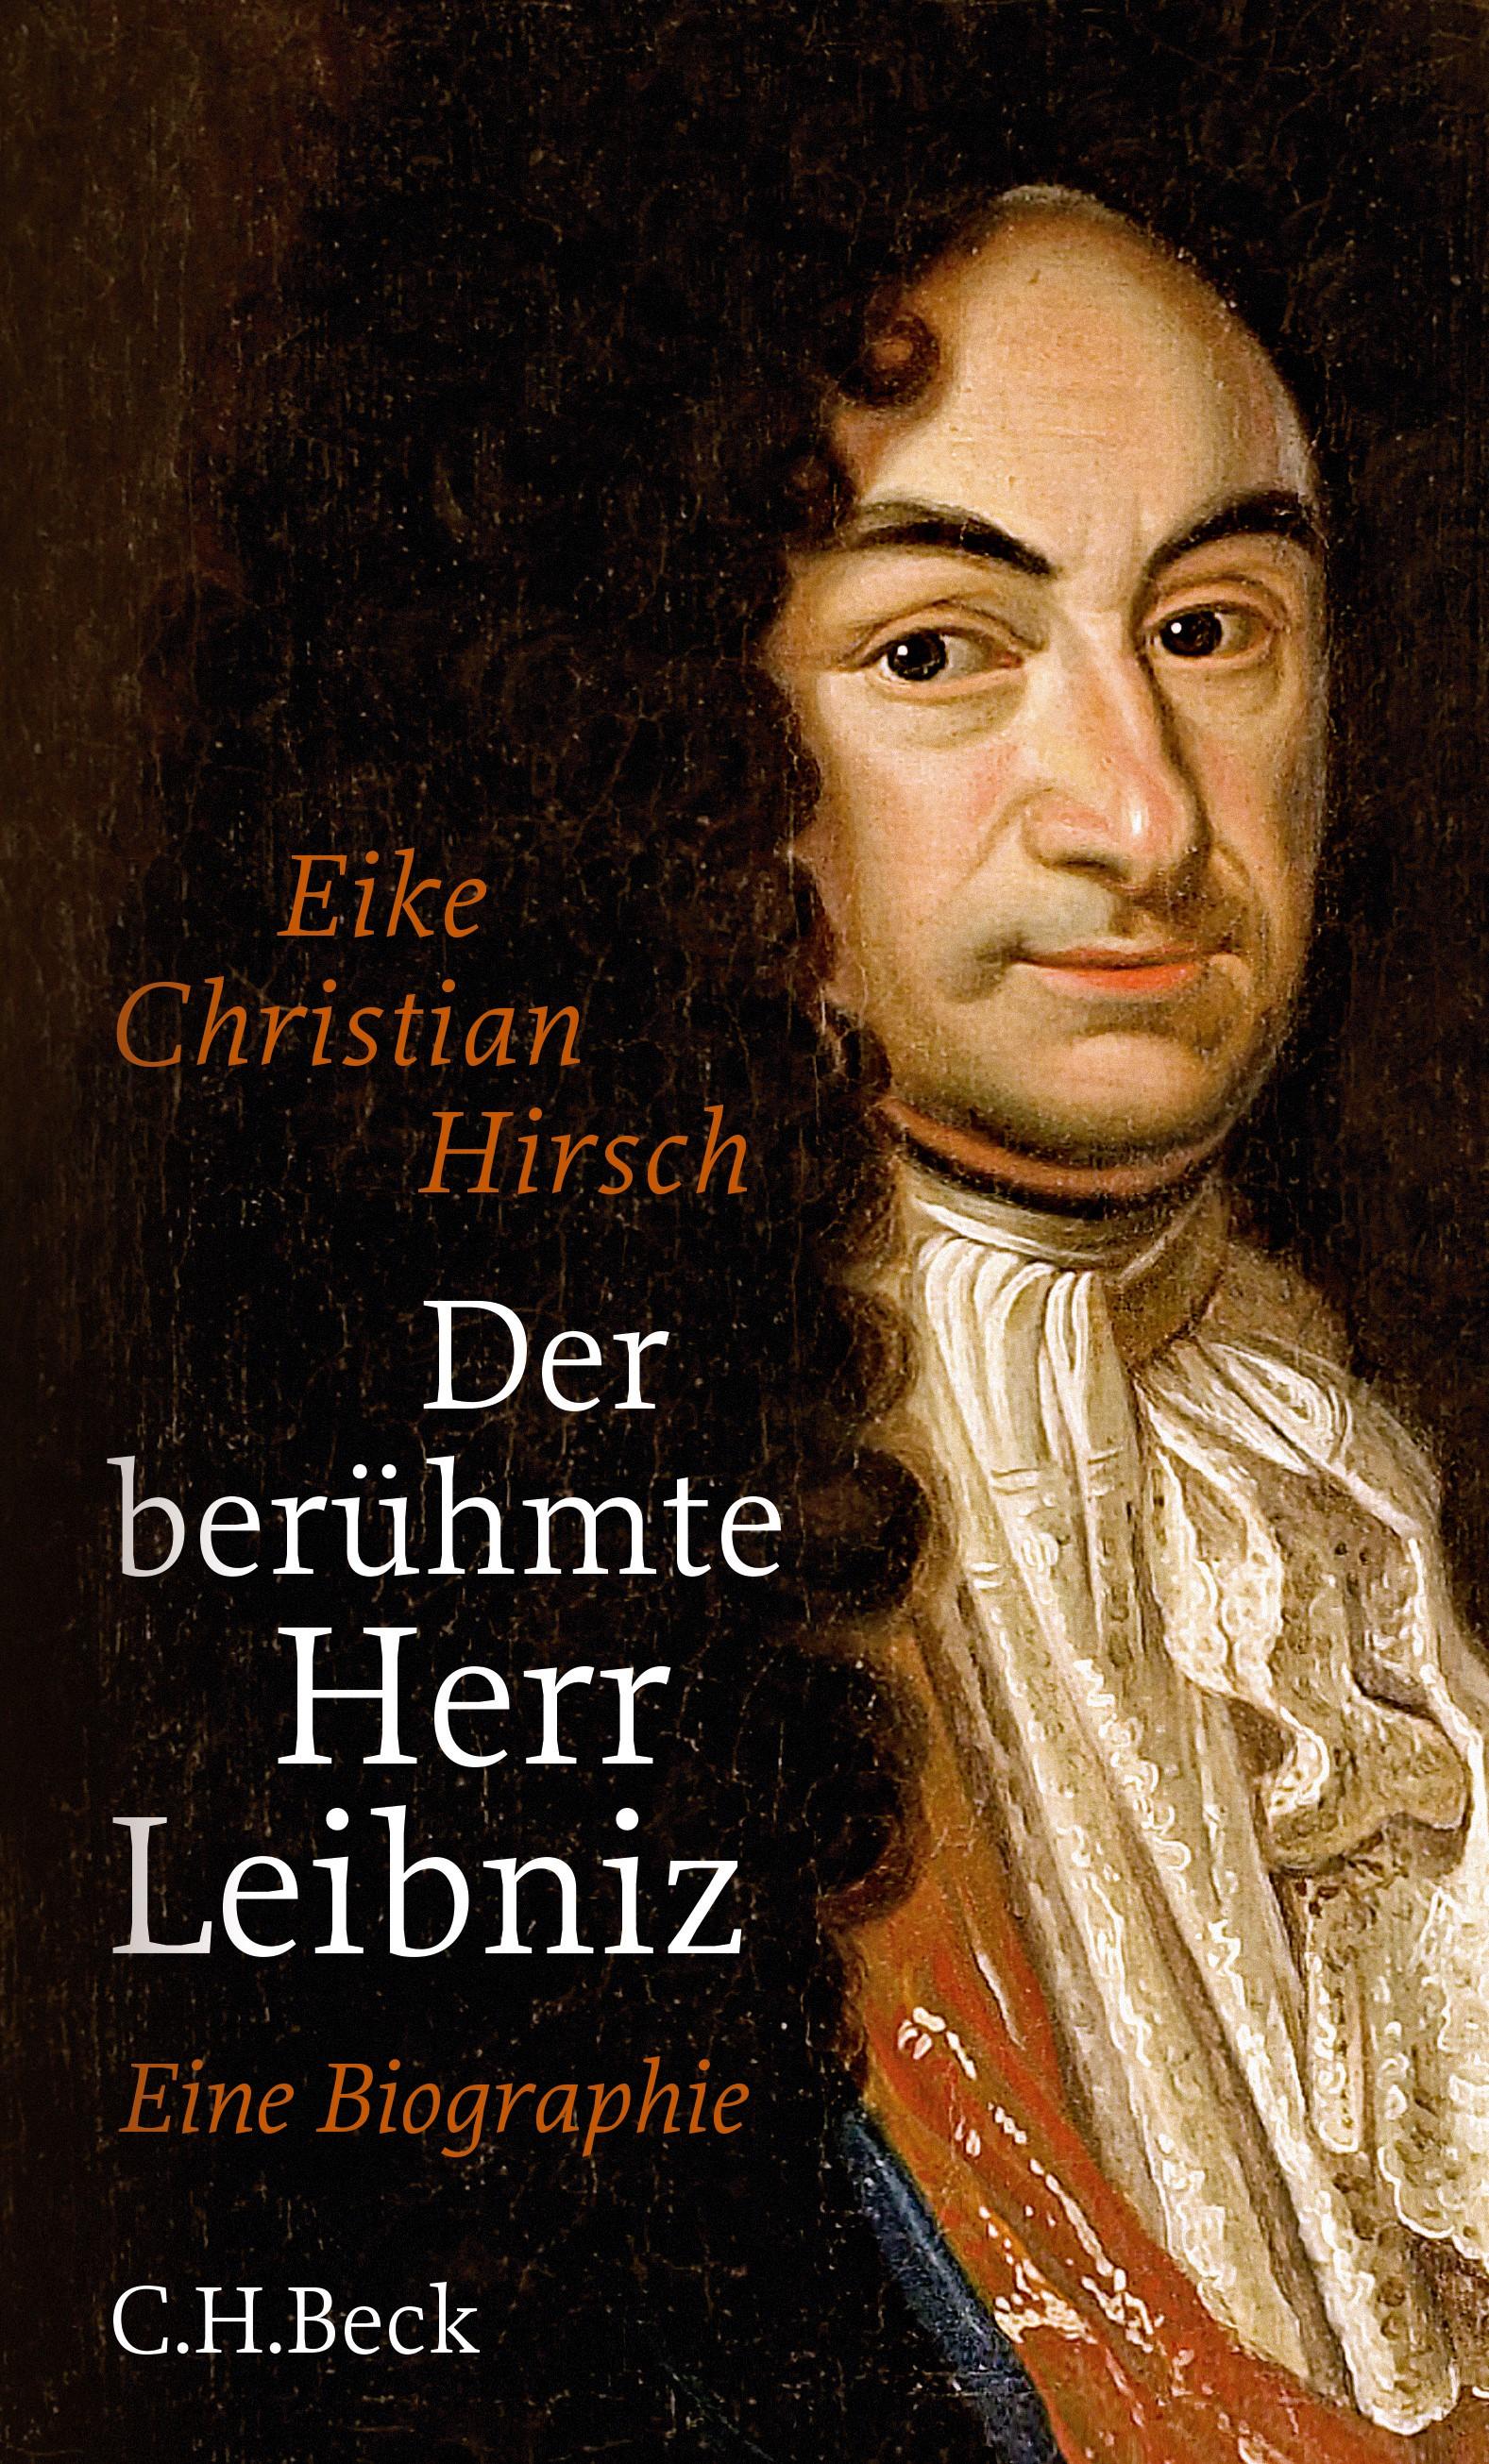 Cover des Buches 'Der berühmte Herr Leibniz'